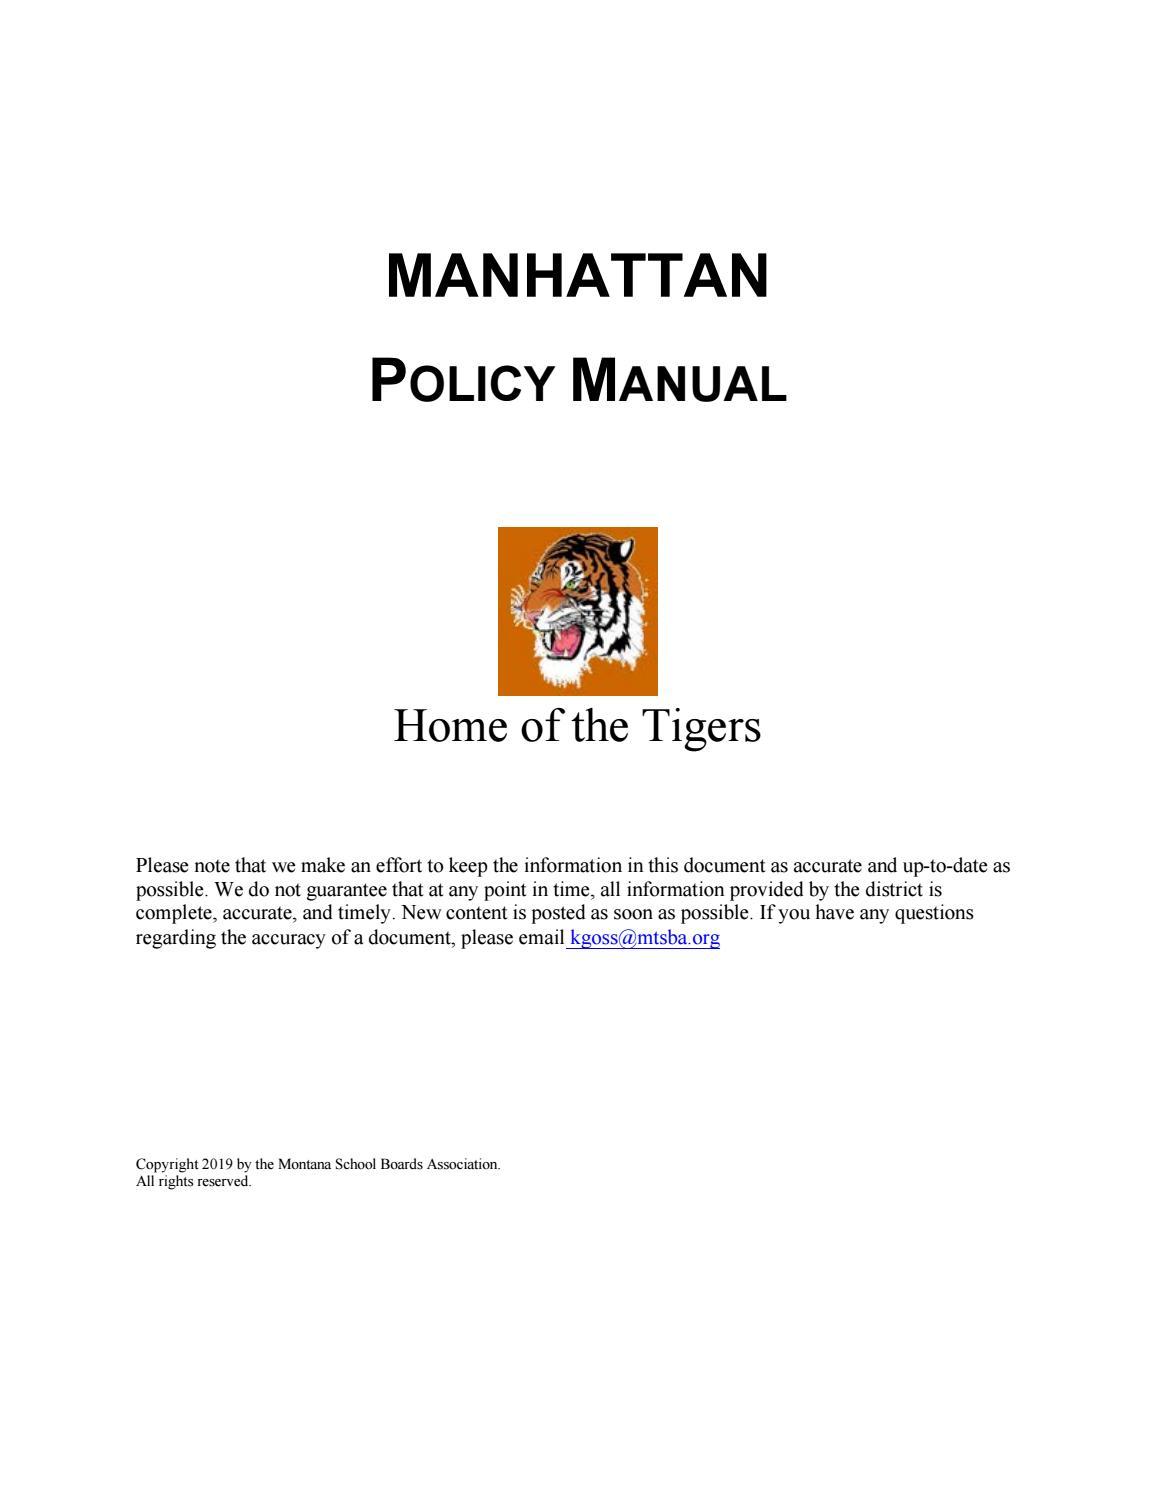 42d77f8617 Manhattan School District Policy Manual by Montana School Boards  Association - issuu